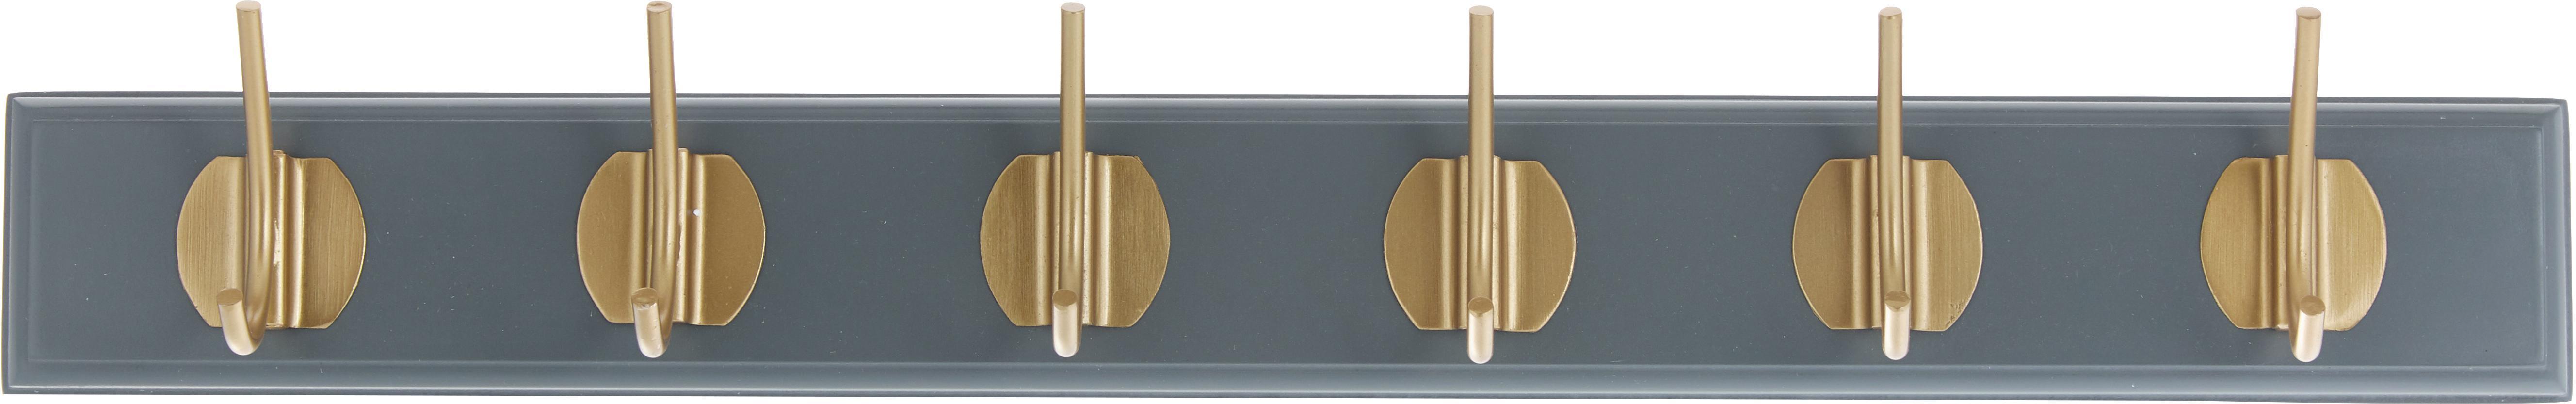 Ganci appendiabiti in metallo Aoife, Asta: pannelli di fibra a media, Grigio, Larg. 60 x Alt. 7 cm